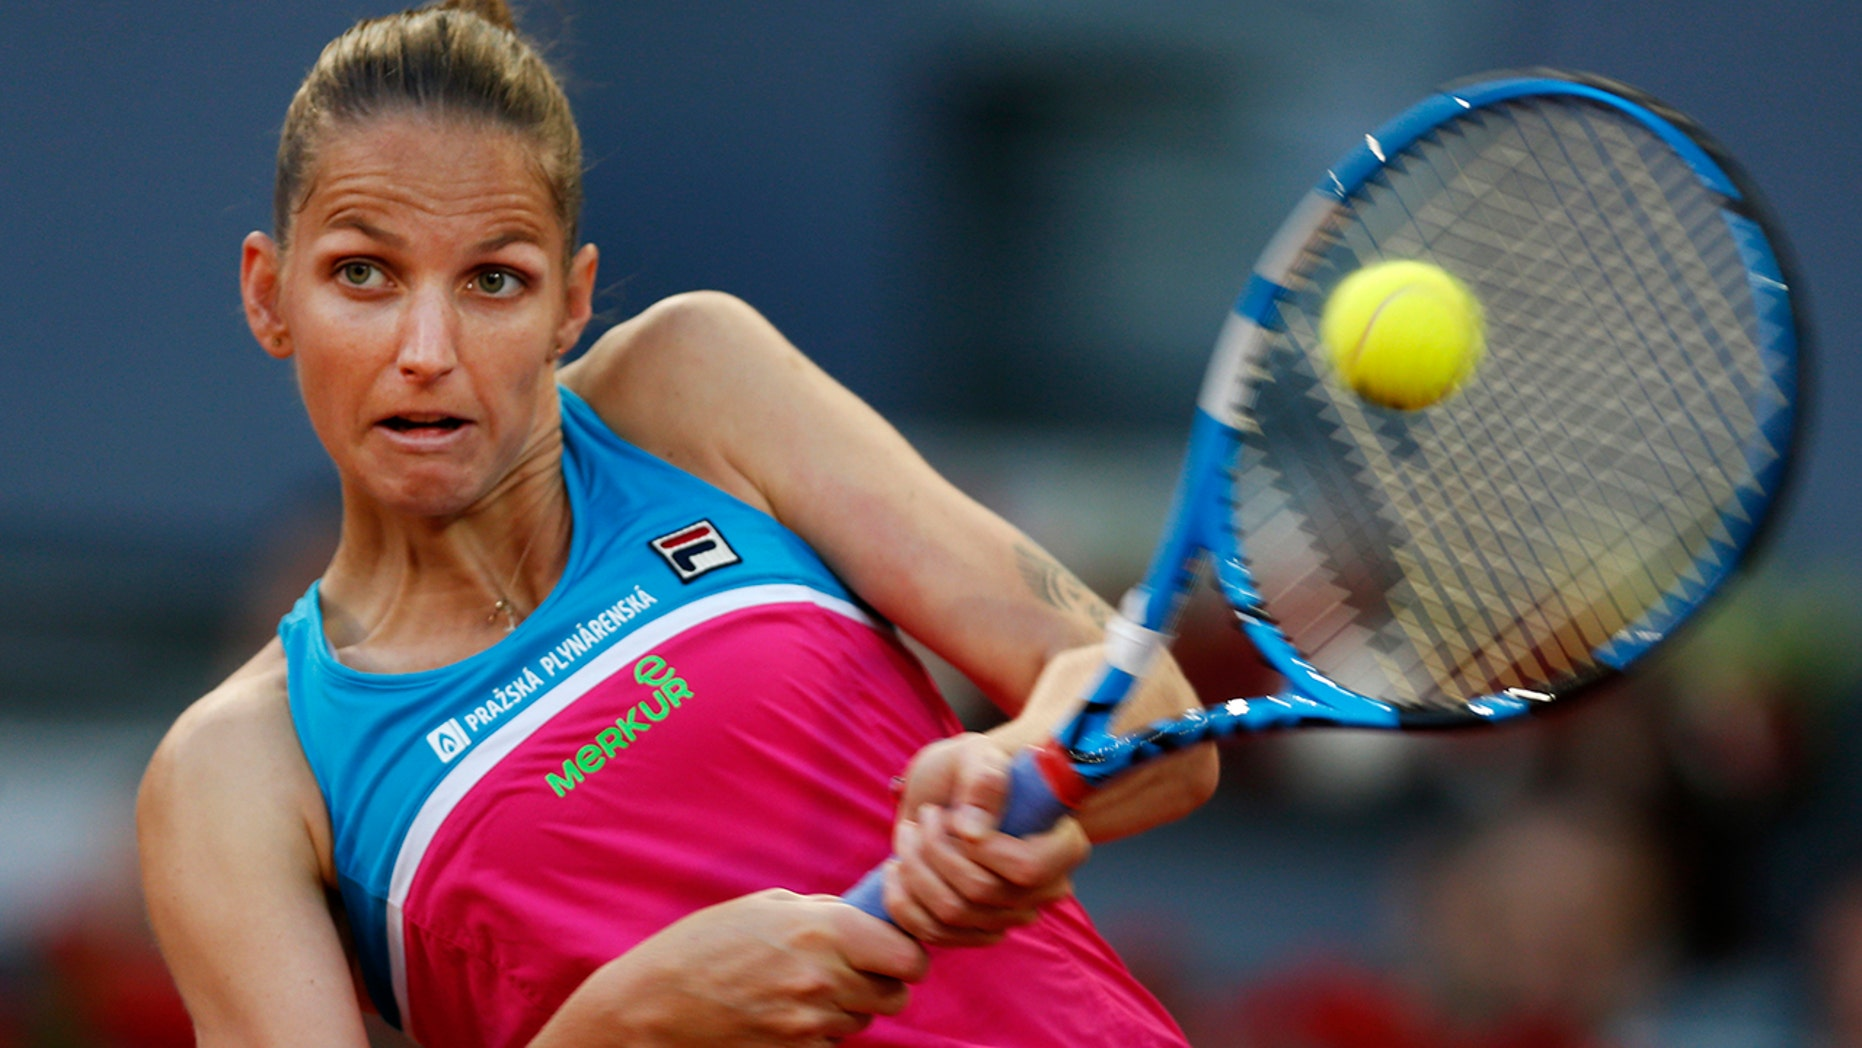 Karolina Pliskova from Czech Republic returns a ball from Czech Republic's Petra Kvitova during a Madrid Open tennis tournament semifinal match in Madrid, Spain